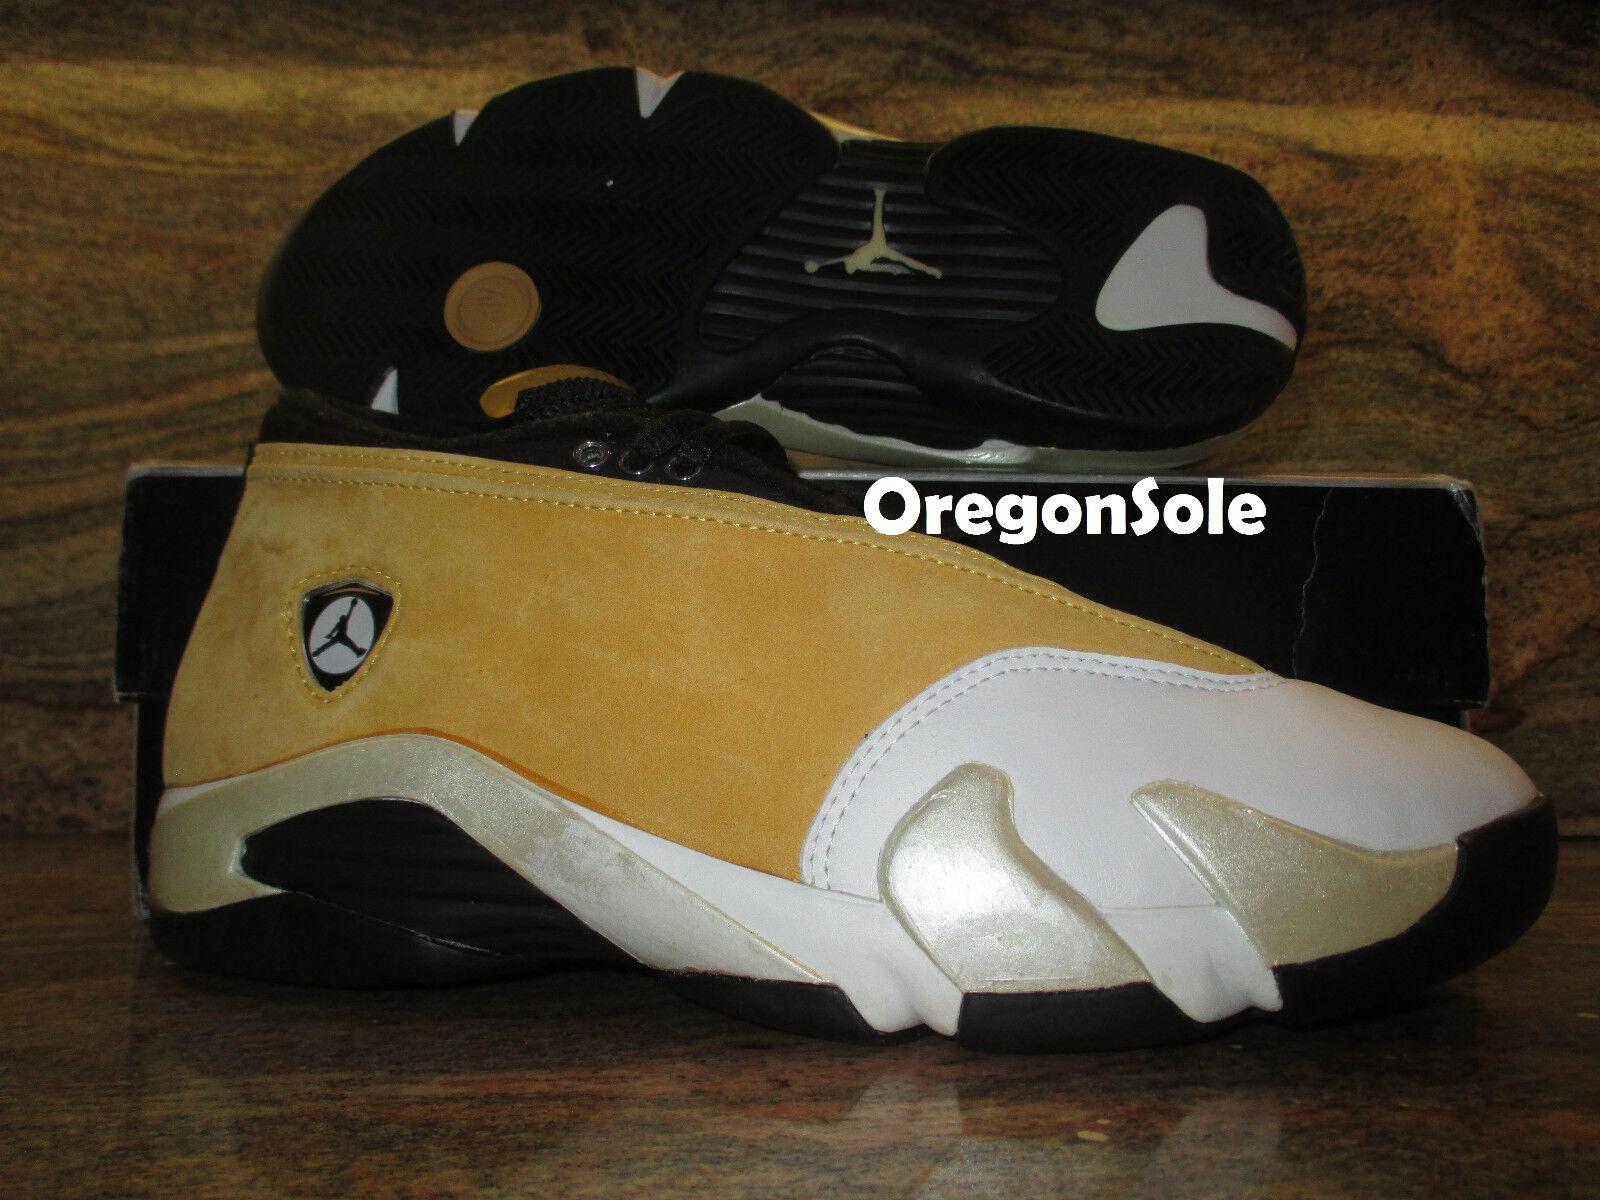 1999 Nike Air Jordan XIV 14 Low OG Sample Price reduction best-selling model of the brand